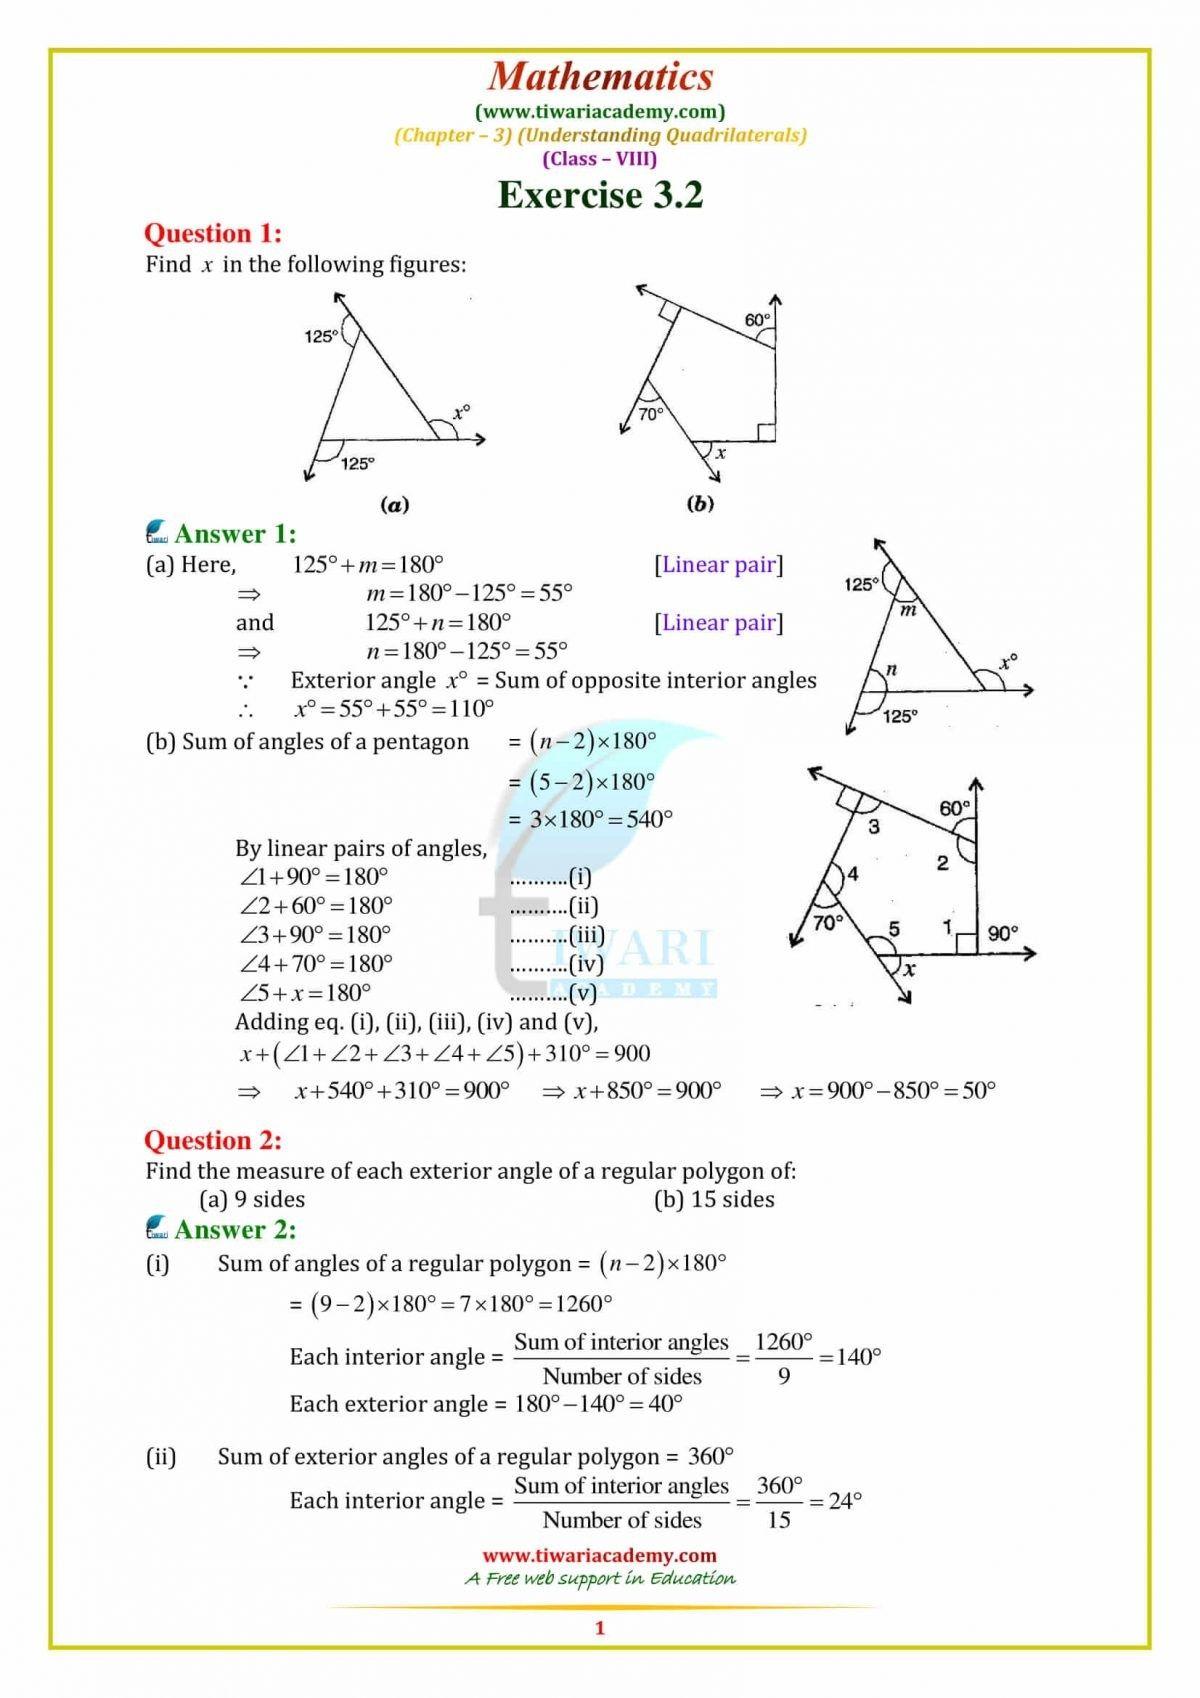 Https Www Tiwariacademy Com Ncert Solutions Ncert Solutions Class 8 Maths Chapter 3 Class 8 Math Quadrilaterals [ 1698 x 1200 Pixel ]